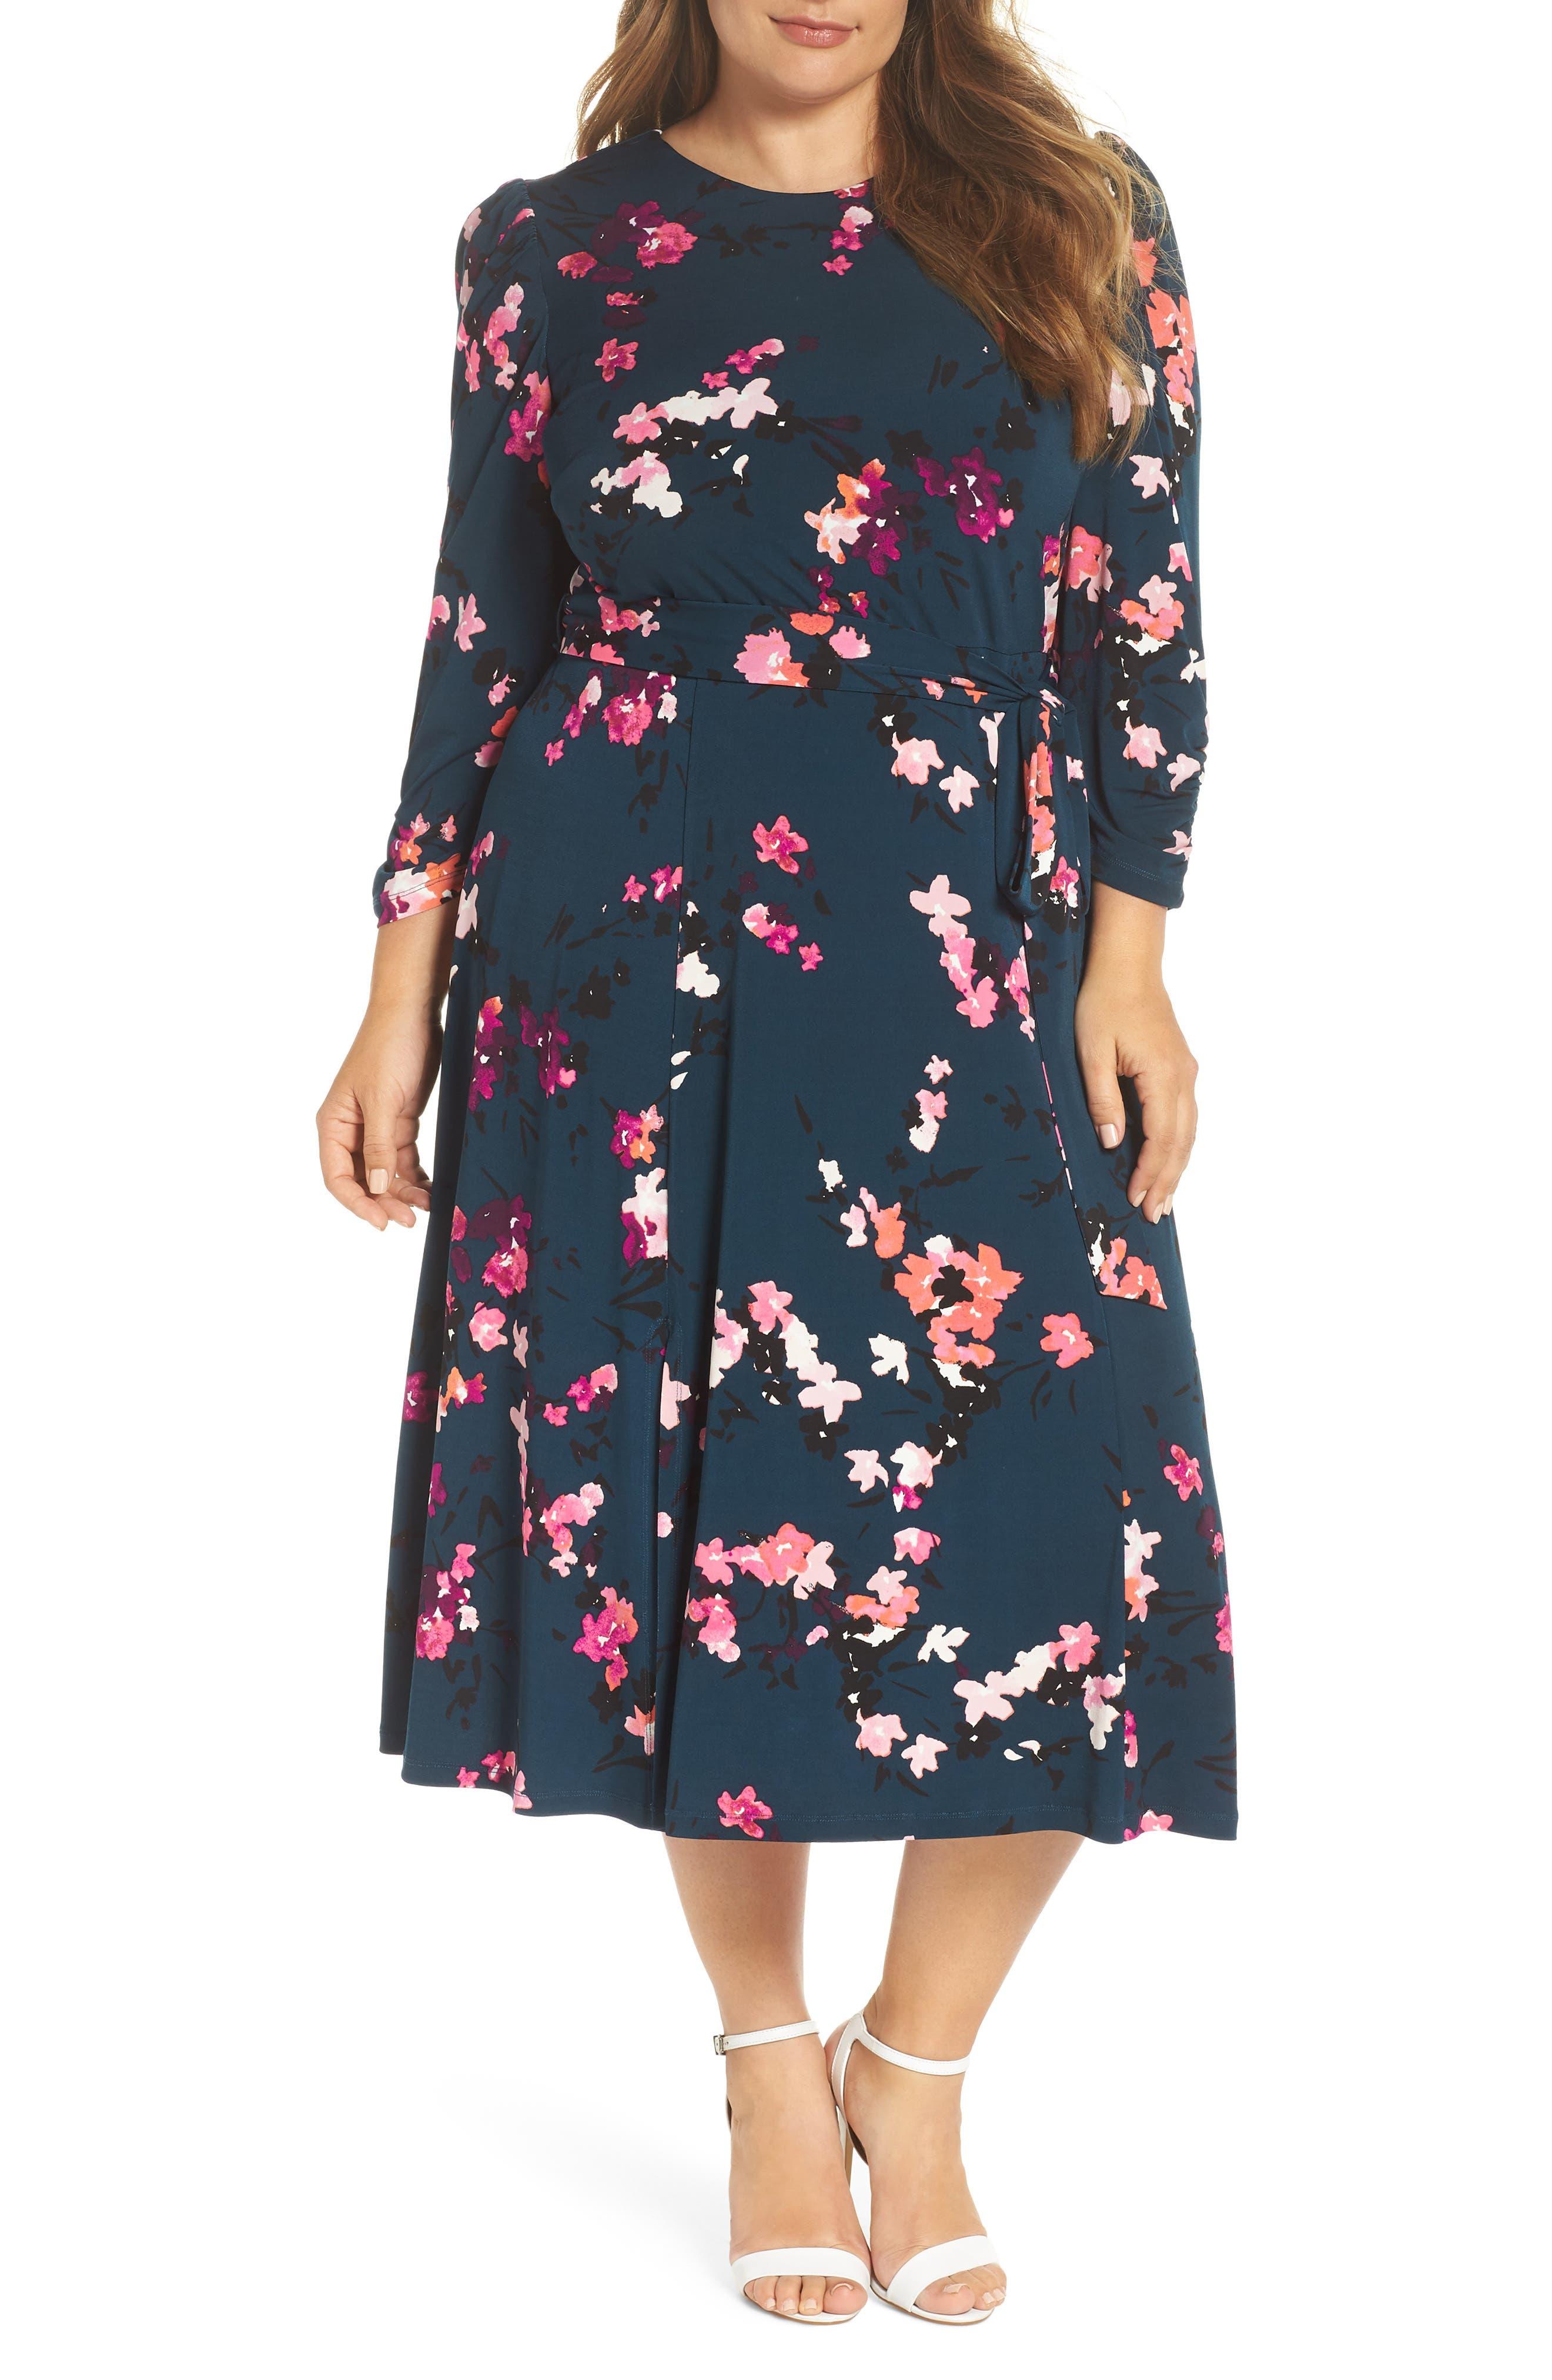 1930s Day Dresses, Afternoon Dresses History Plus Size Womens Eliza J Floral Print Midi Dress $88.80 AT vintagedancer.com